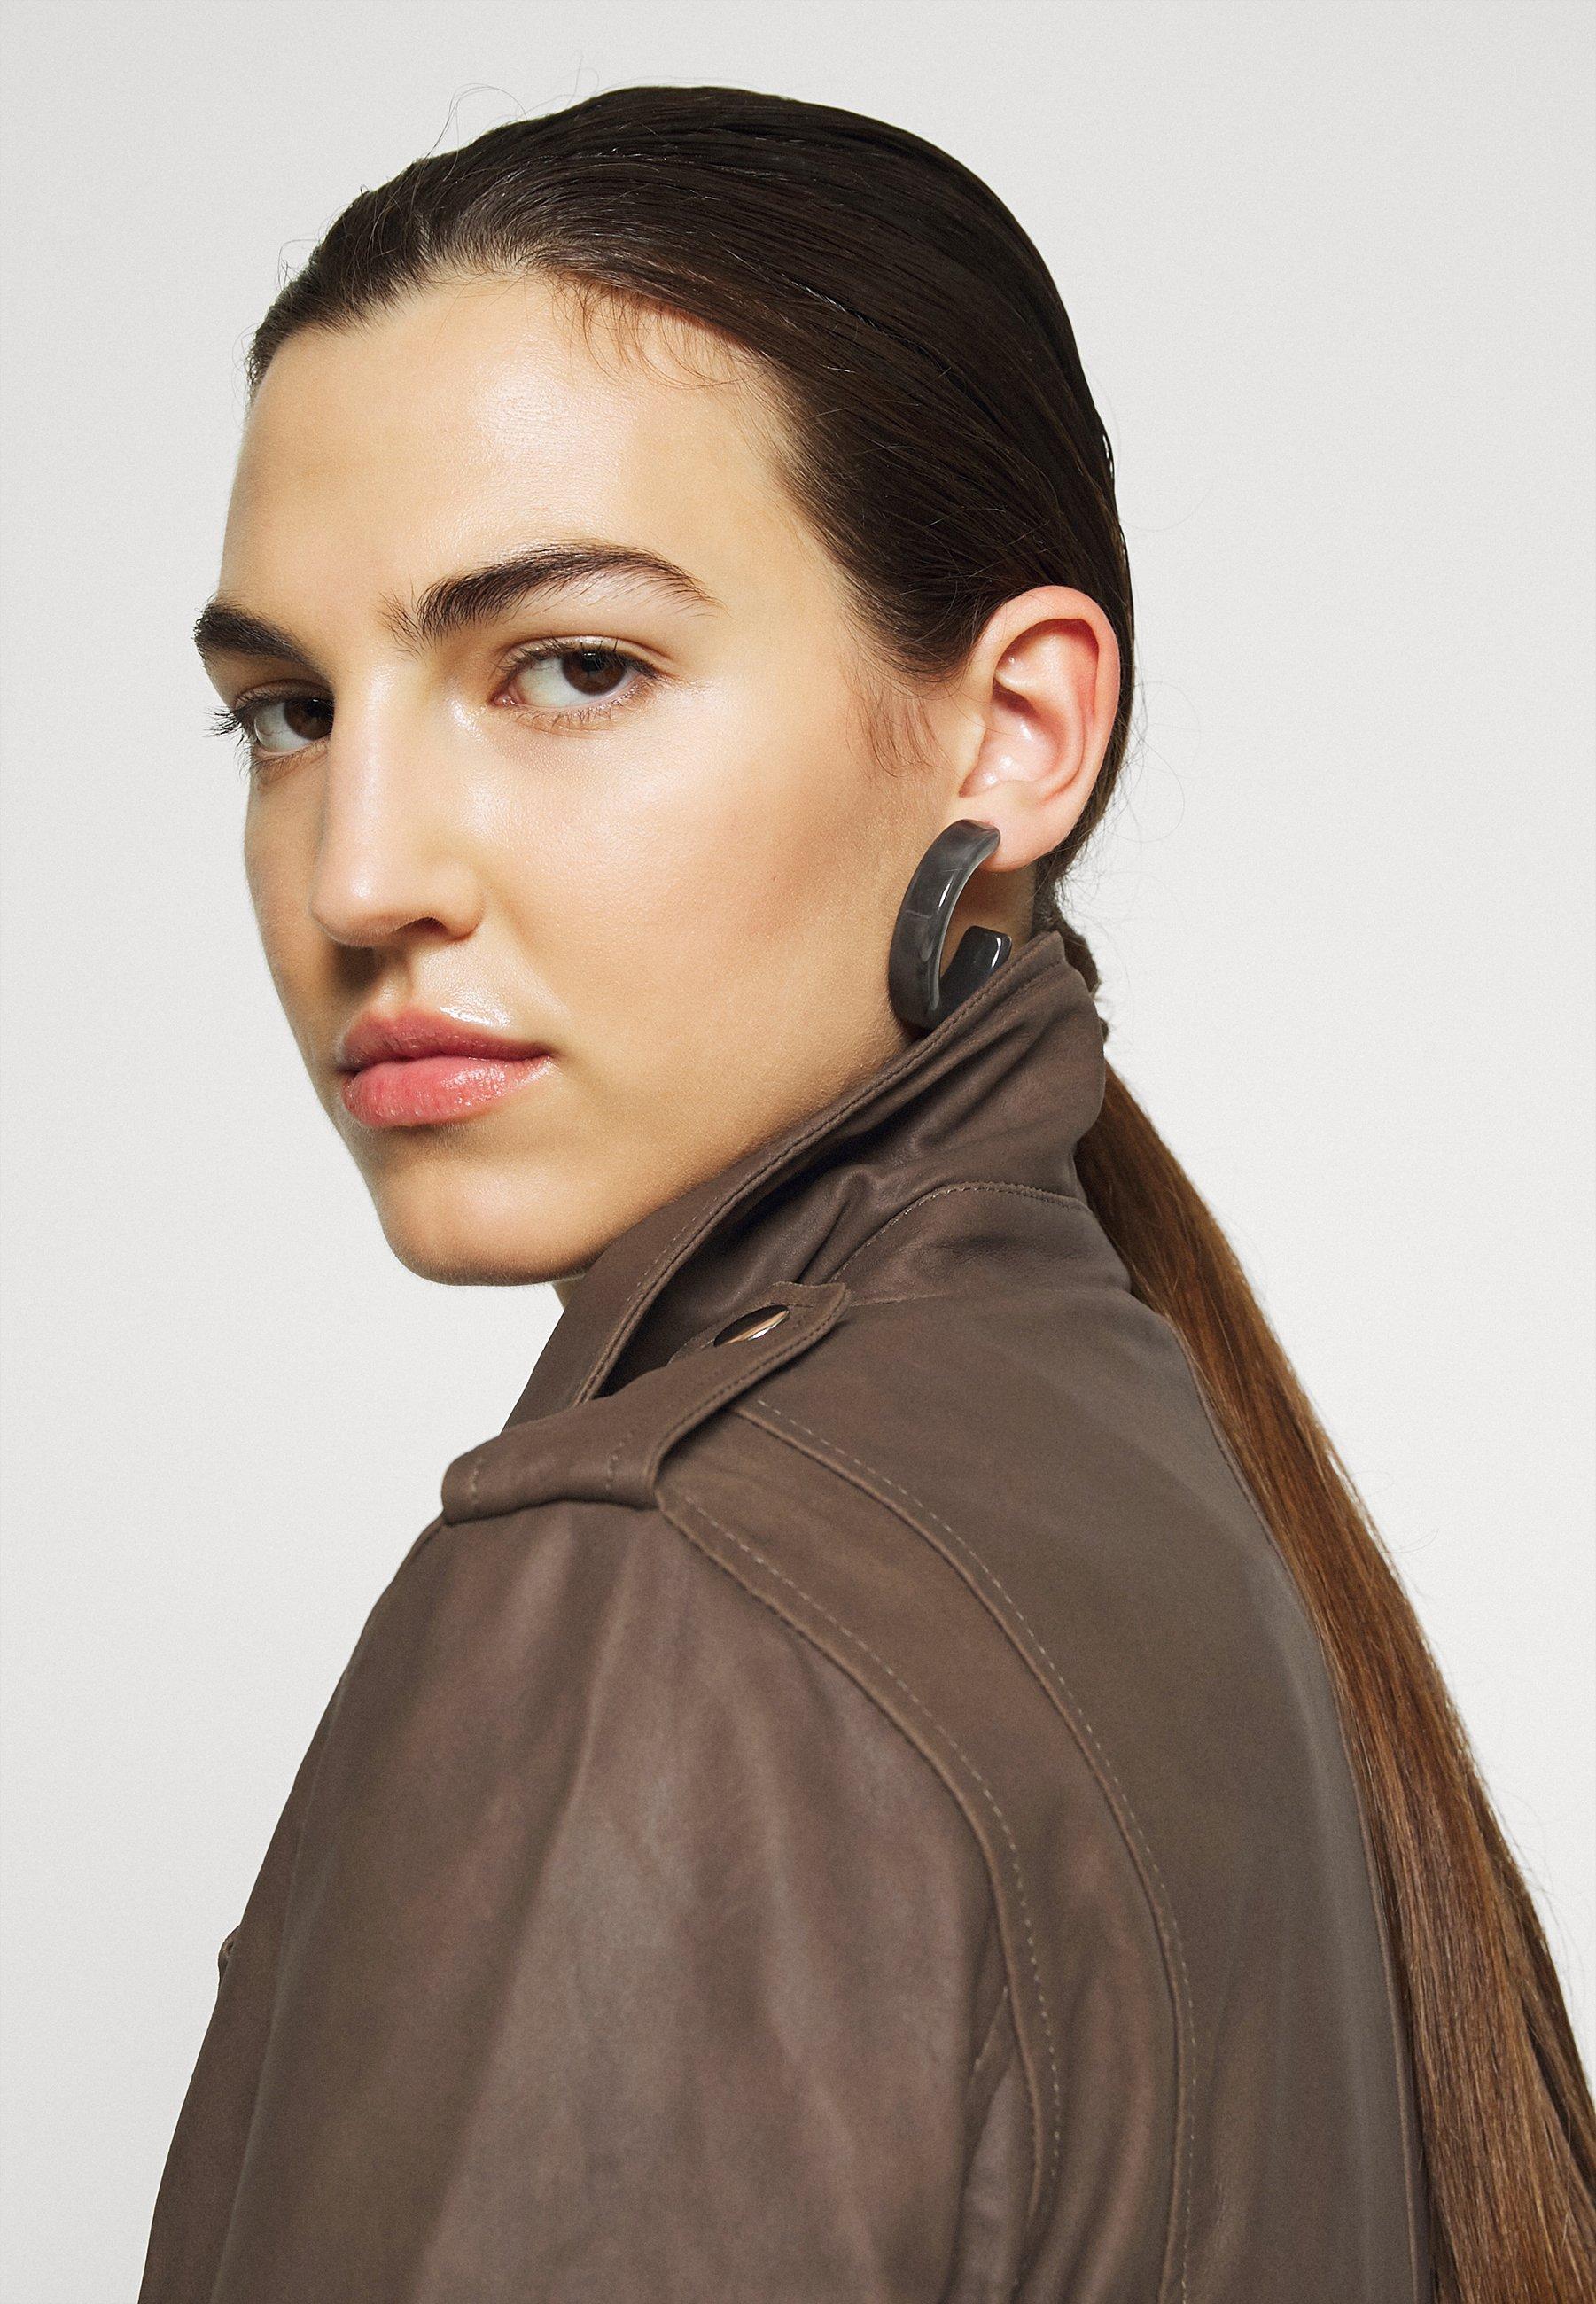 Shopping Online Women's Clothing DEPECHE JACKET Leather jacket dusty taupe 2bLDjctsb